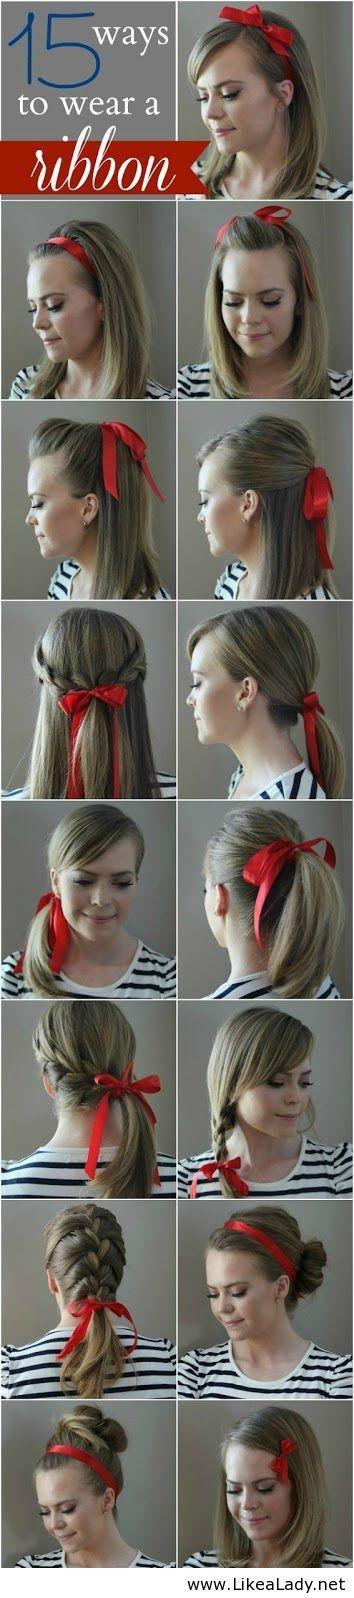 Ways to wear a ribbon